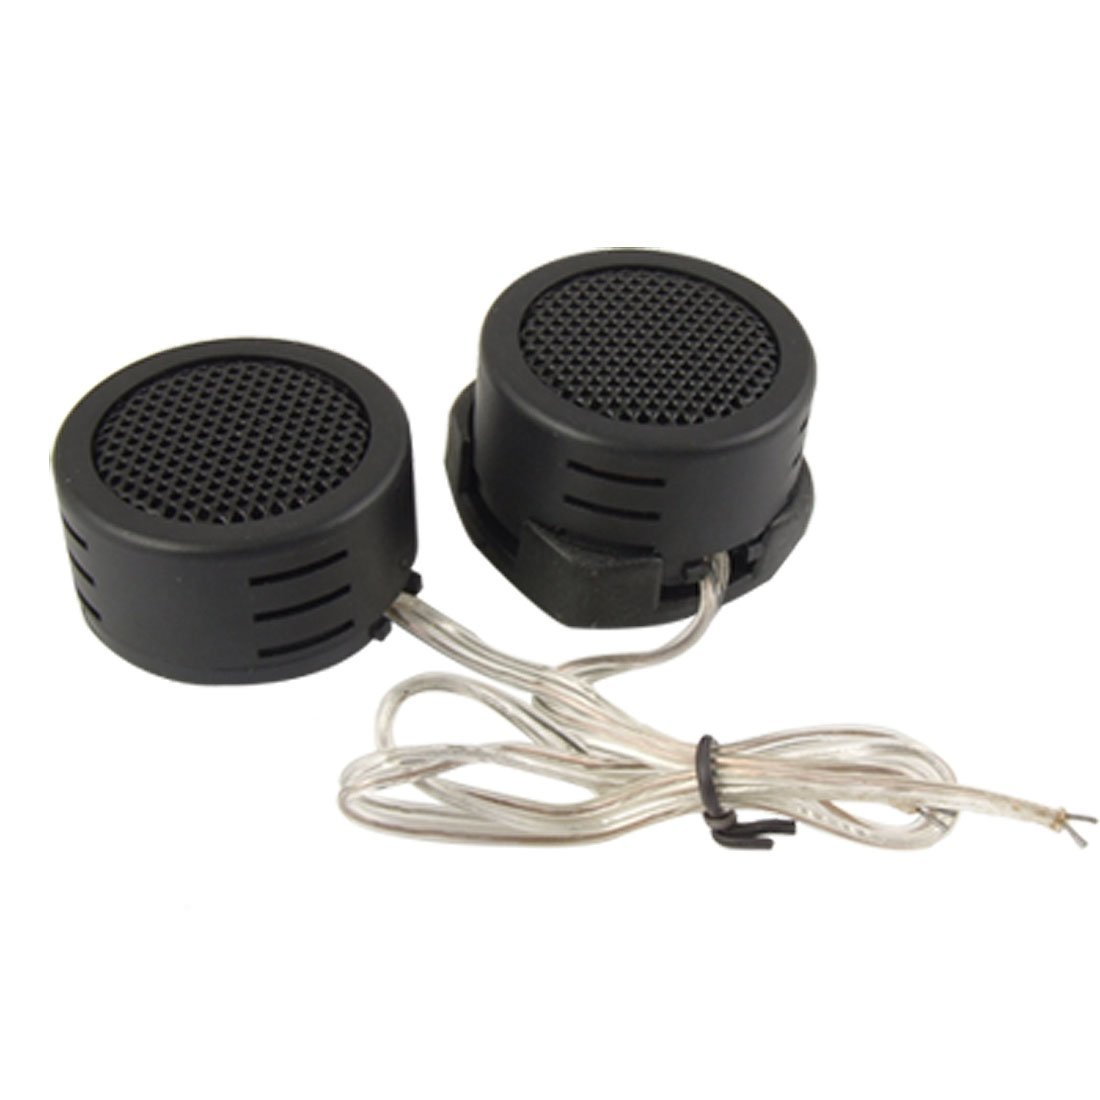 SODIAL(R) 2 Pcs Black Plastic Dome Car Auto Tweeter Speakers